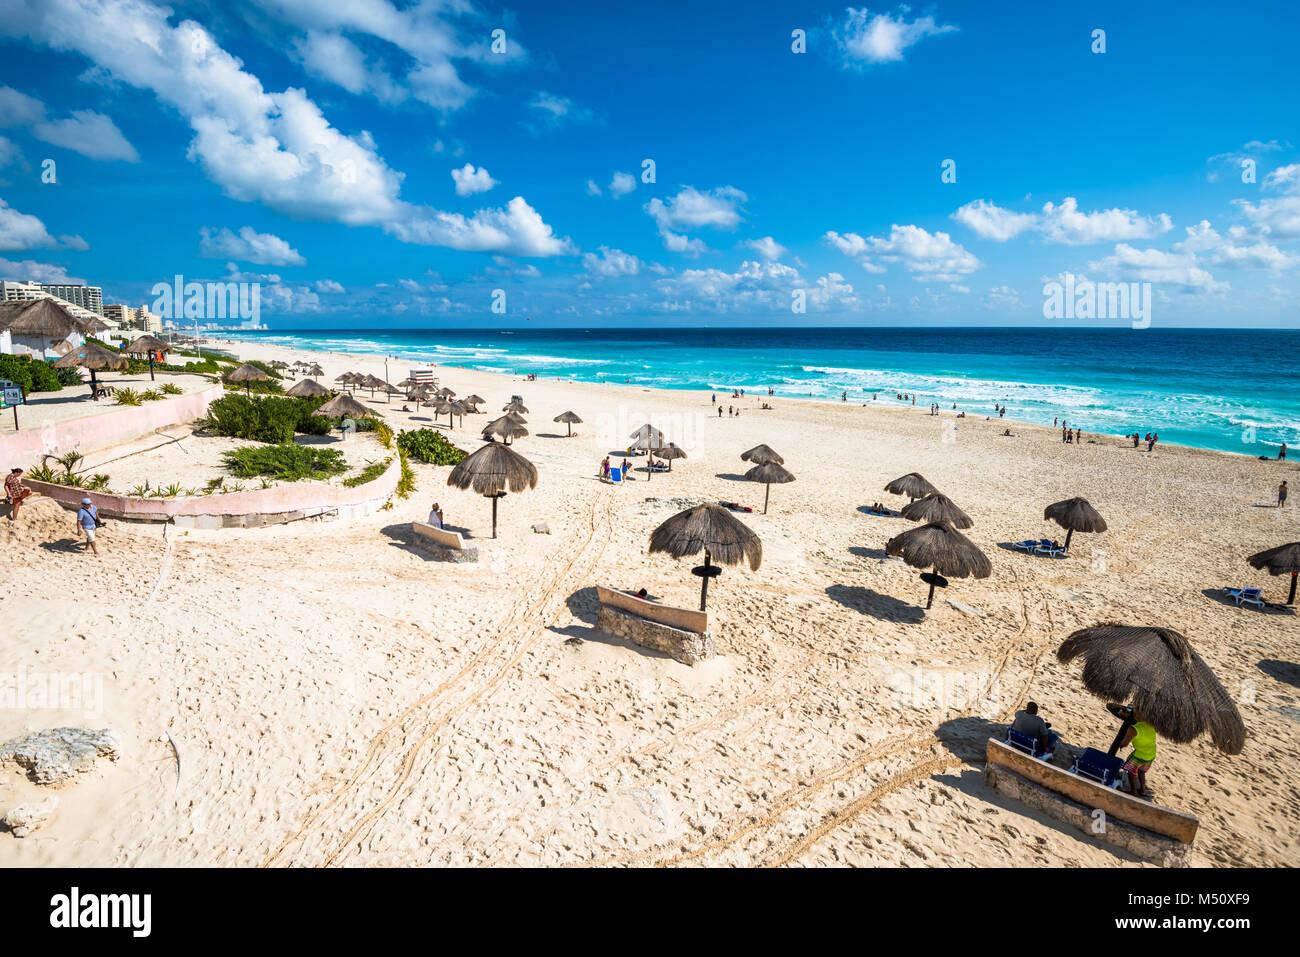 Cancun beach panorama, Mexico - Stock Image